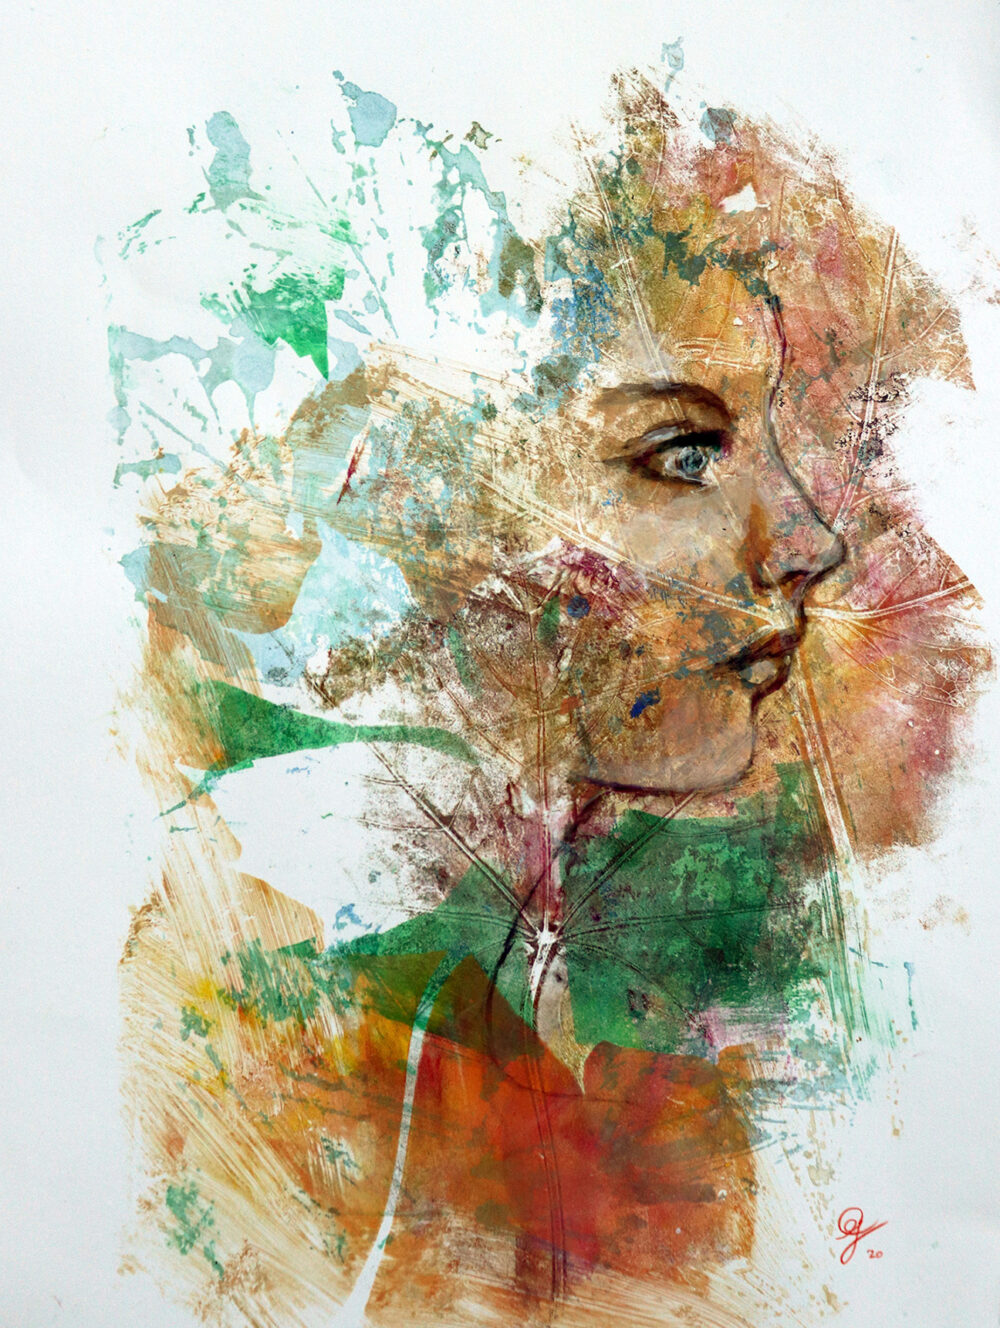 peinture-portrait-profil-femme-impression-botanique-artiste-peintre-carine-genadry